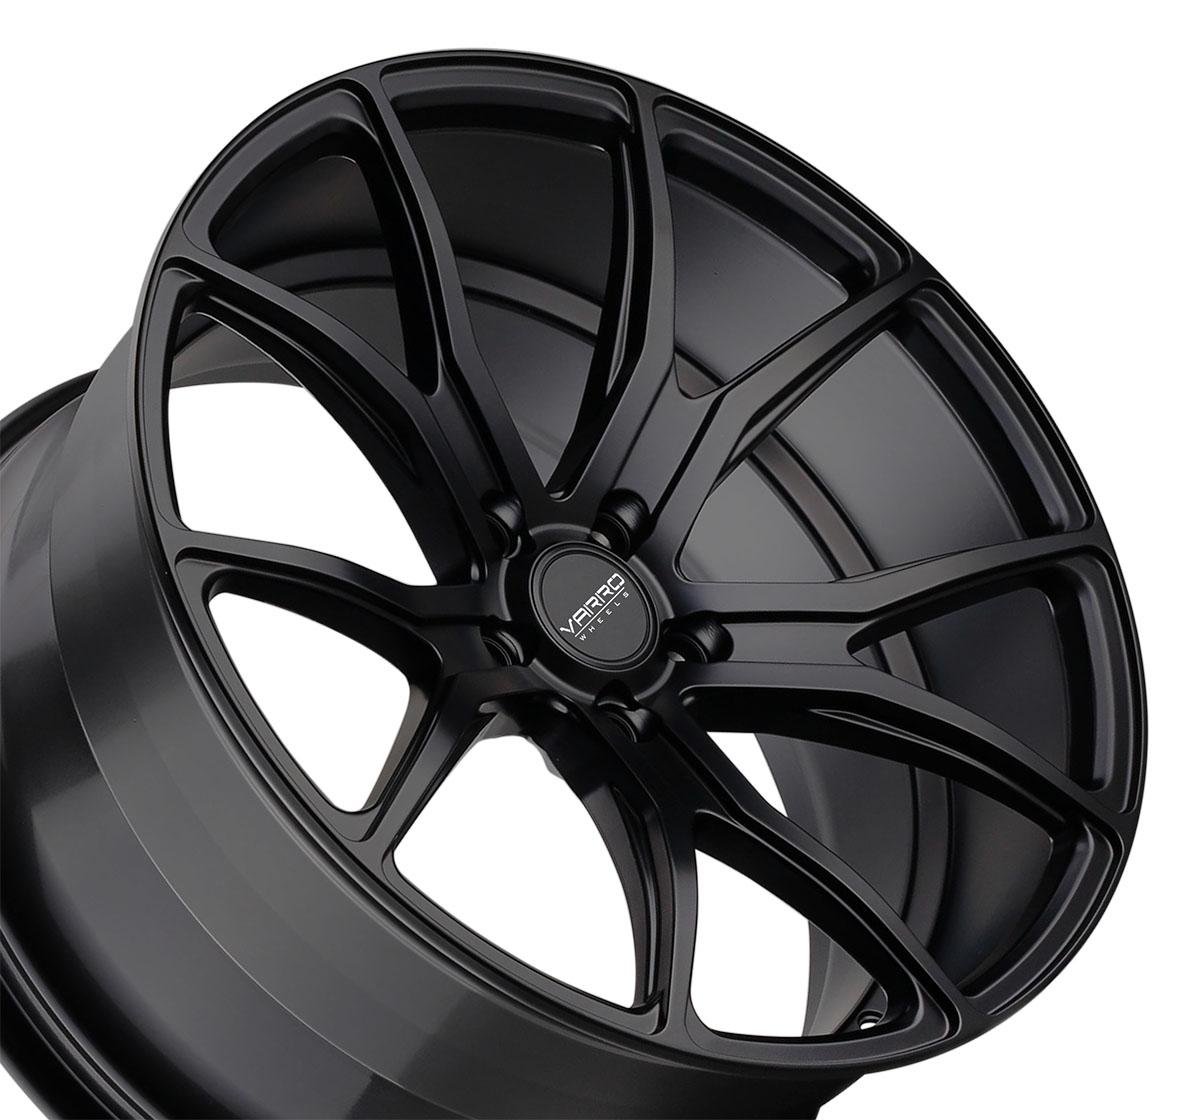 Varro Wheels Vd01 Concave 5x114 3 Uniqperformance